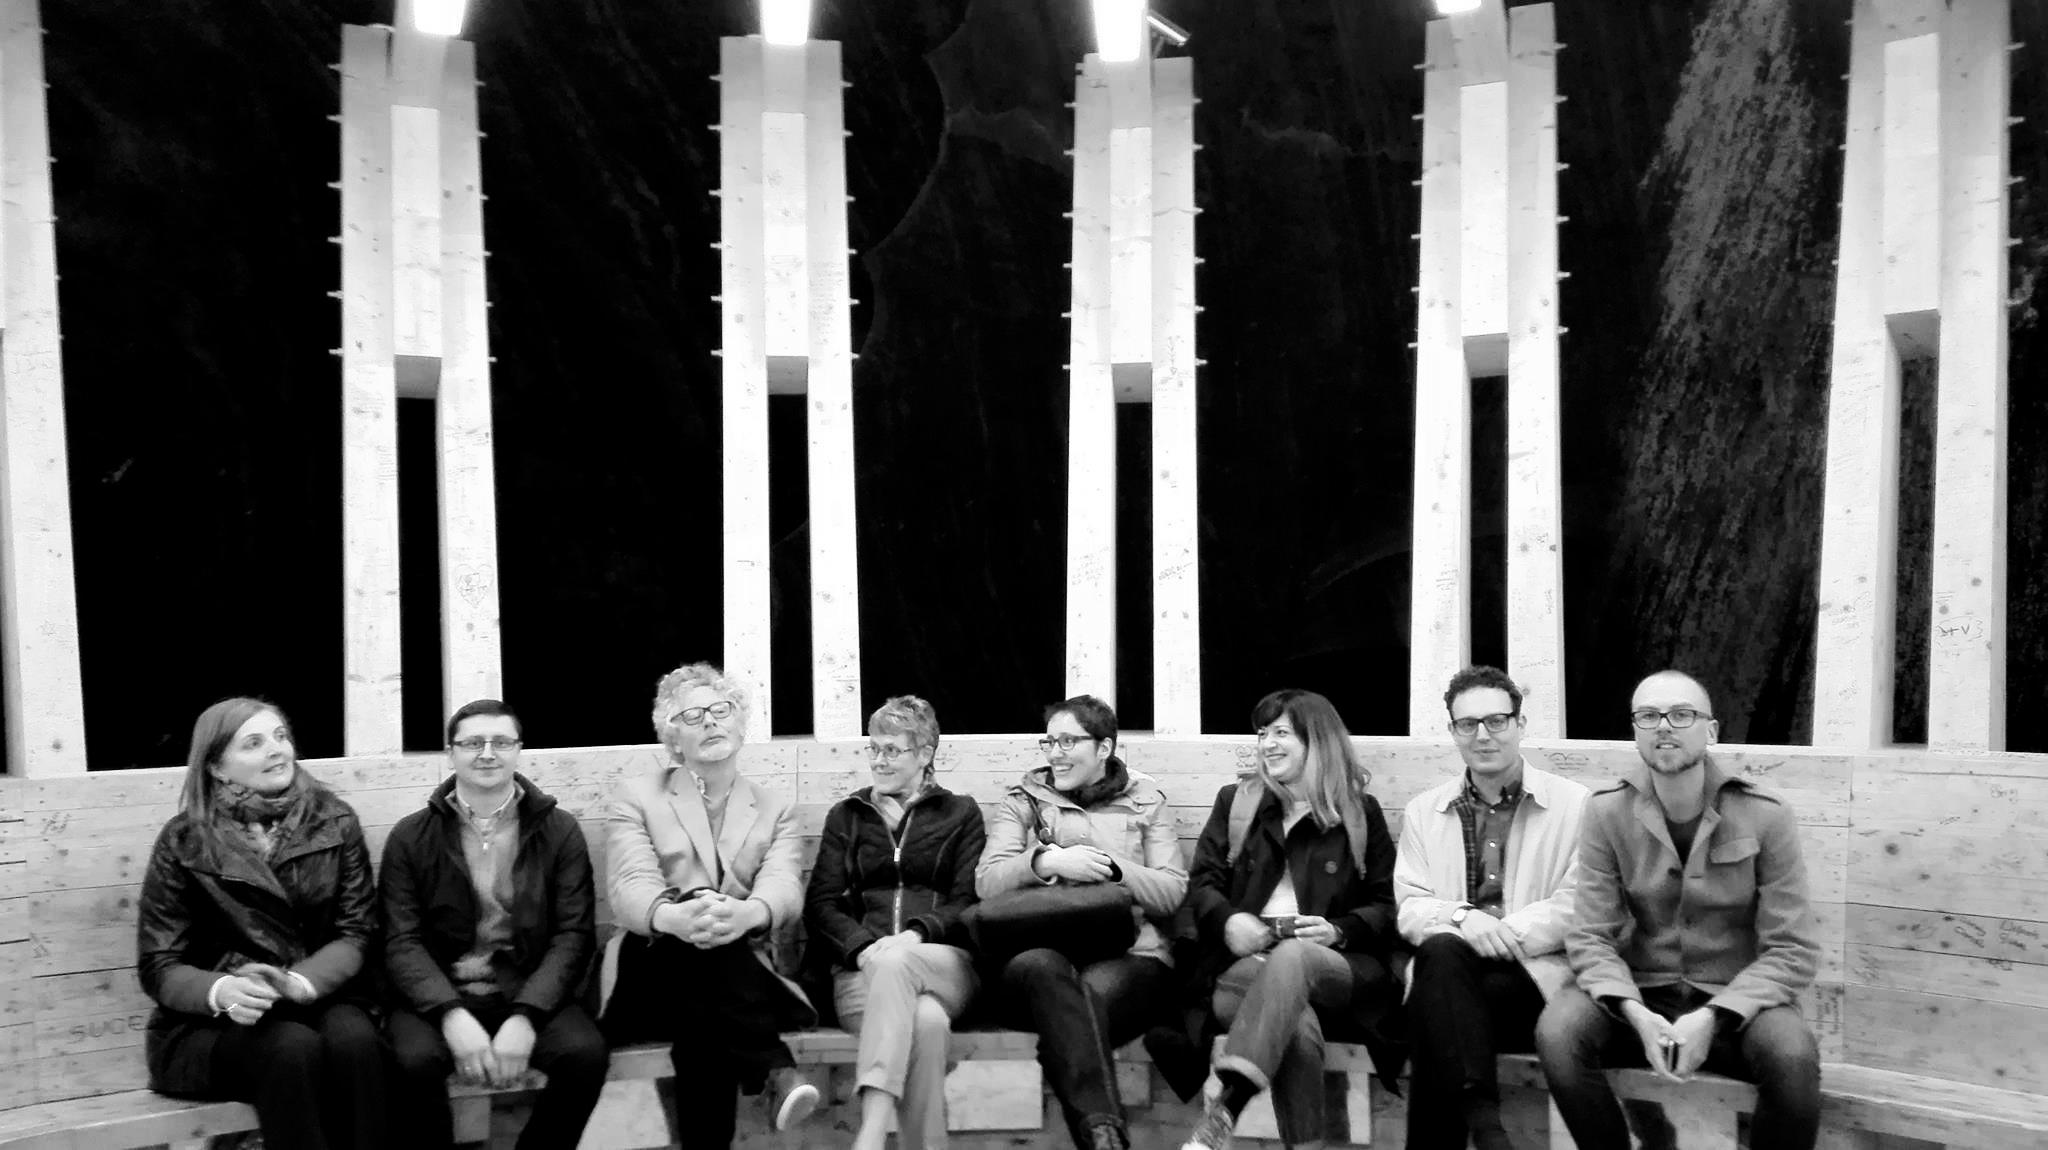 Vlnr: Sorina Stanca, Thomasz Parkola, Rob Davies, Breda Karun, Gorana Tuskan, Despina Gerasimidou, Diego Gracia, ikzelf. Niet op de foto staan Mogen Vestergaard, Nienke van Schaverbeke en Parina Vasilopoulou).